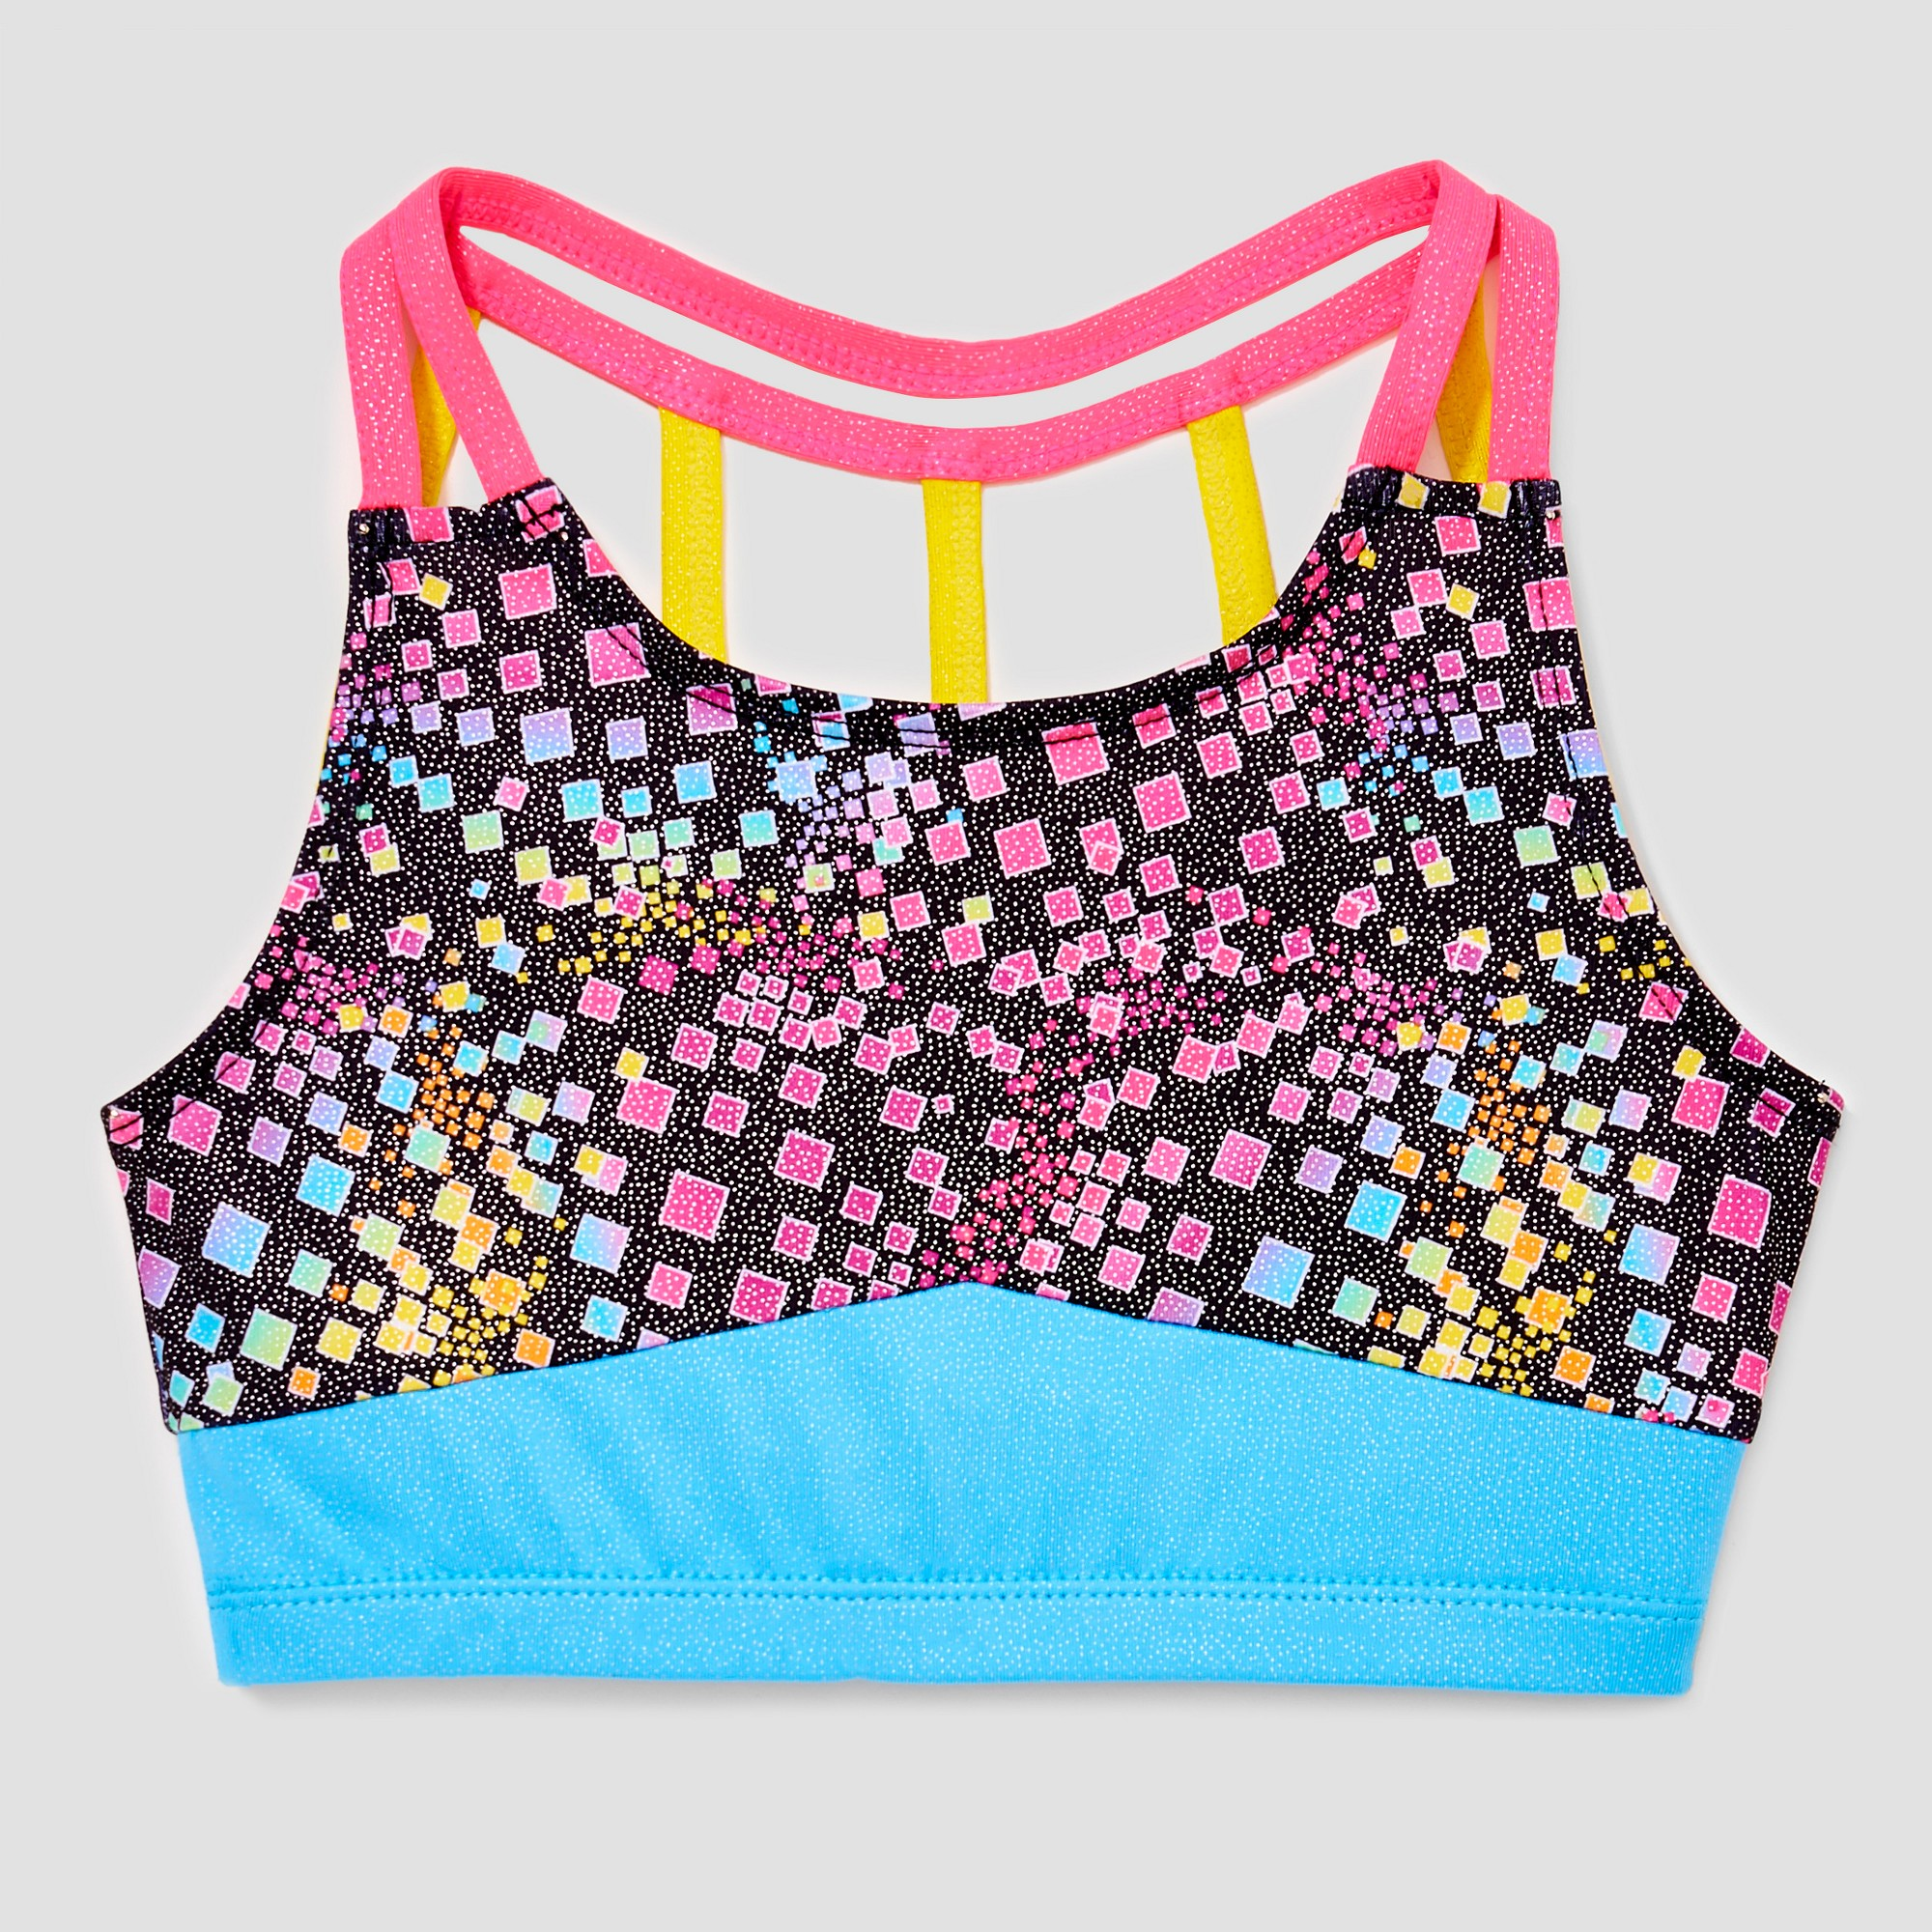 Freestyle by Danskin Girls/' Crop Top Gym Wear Athletic